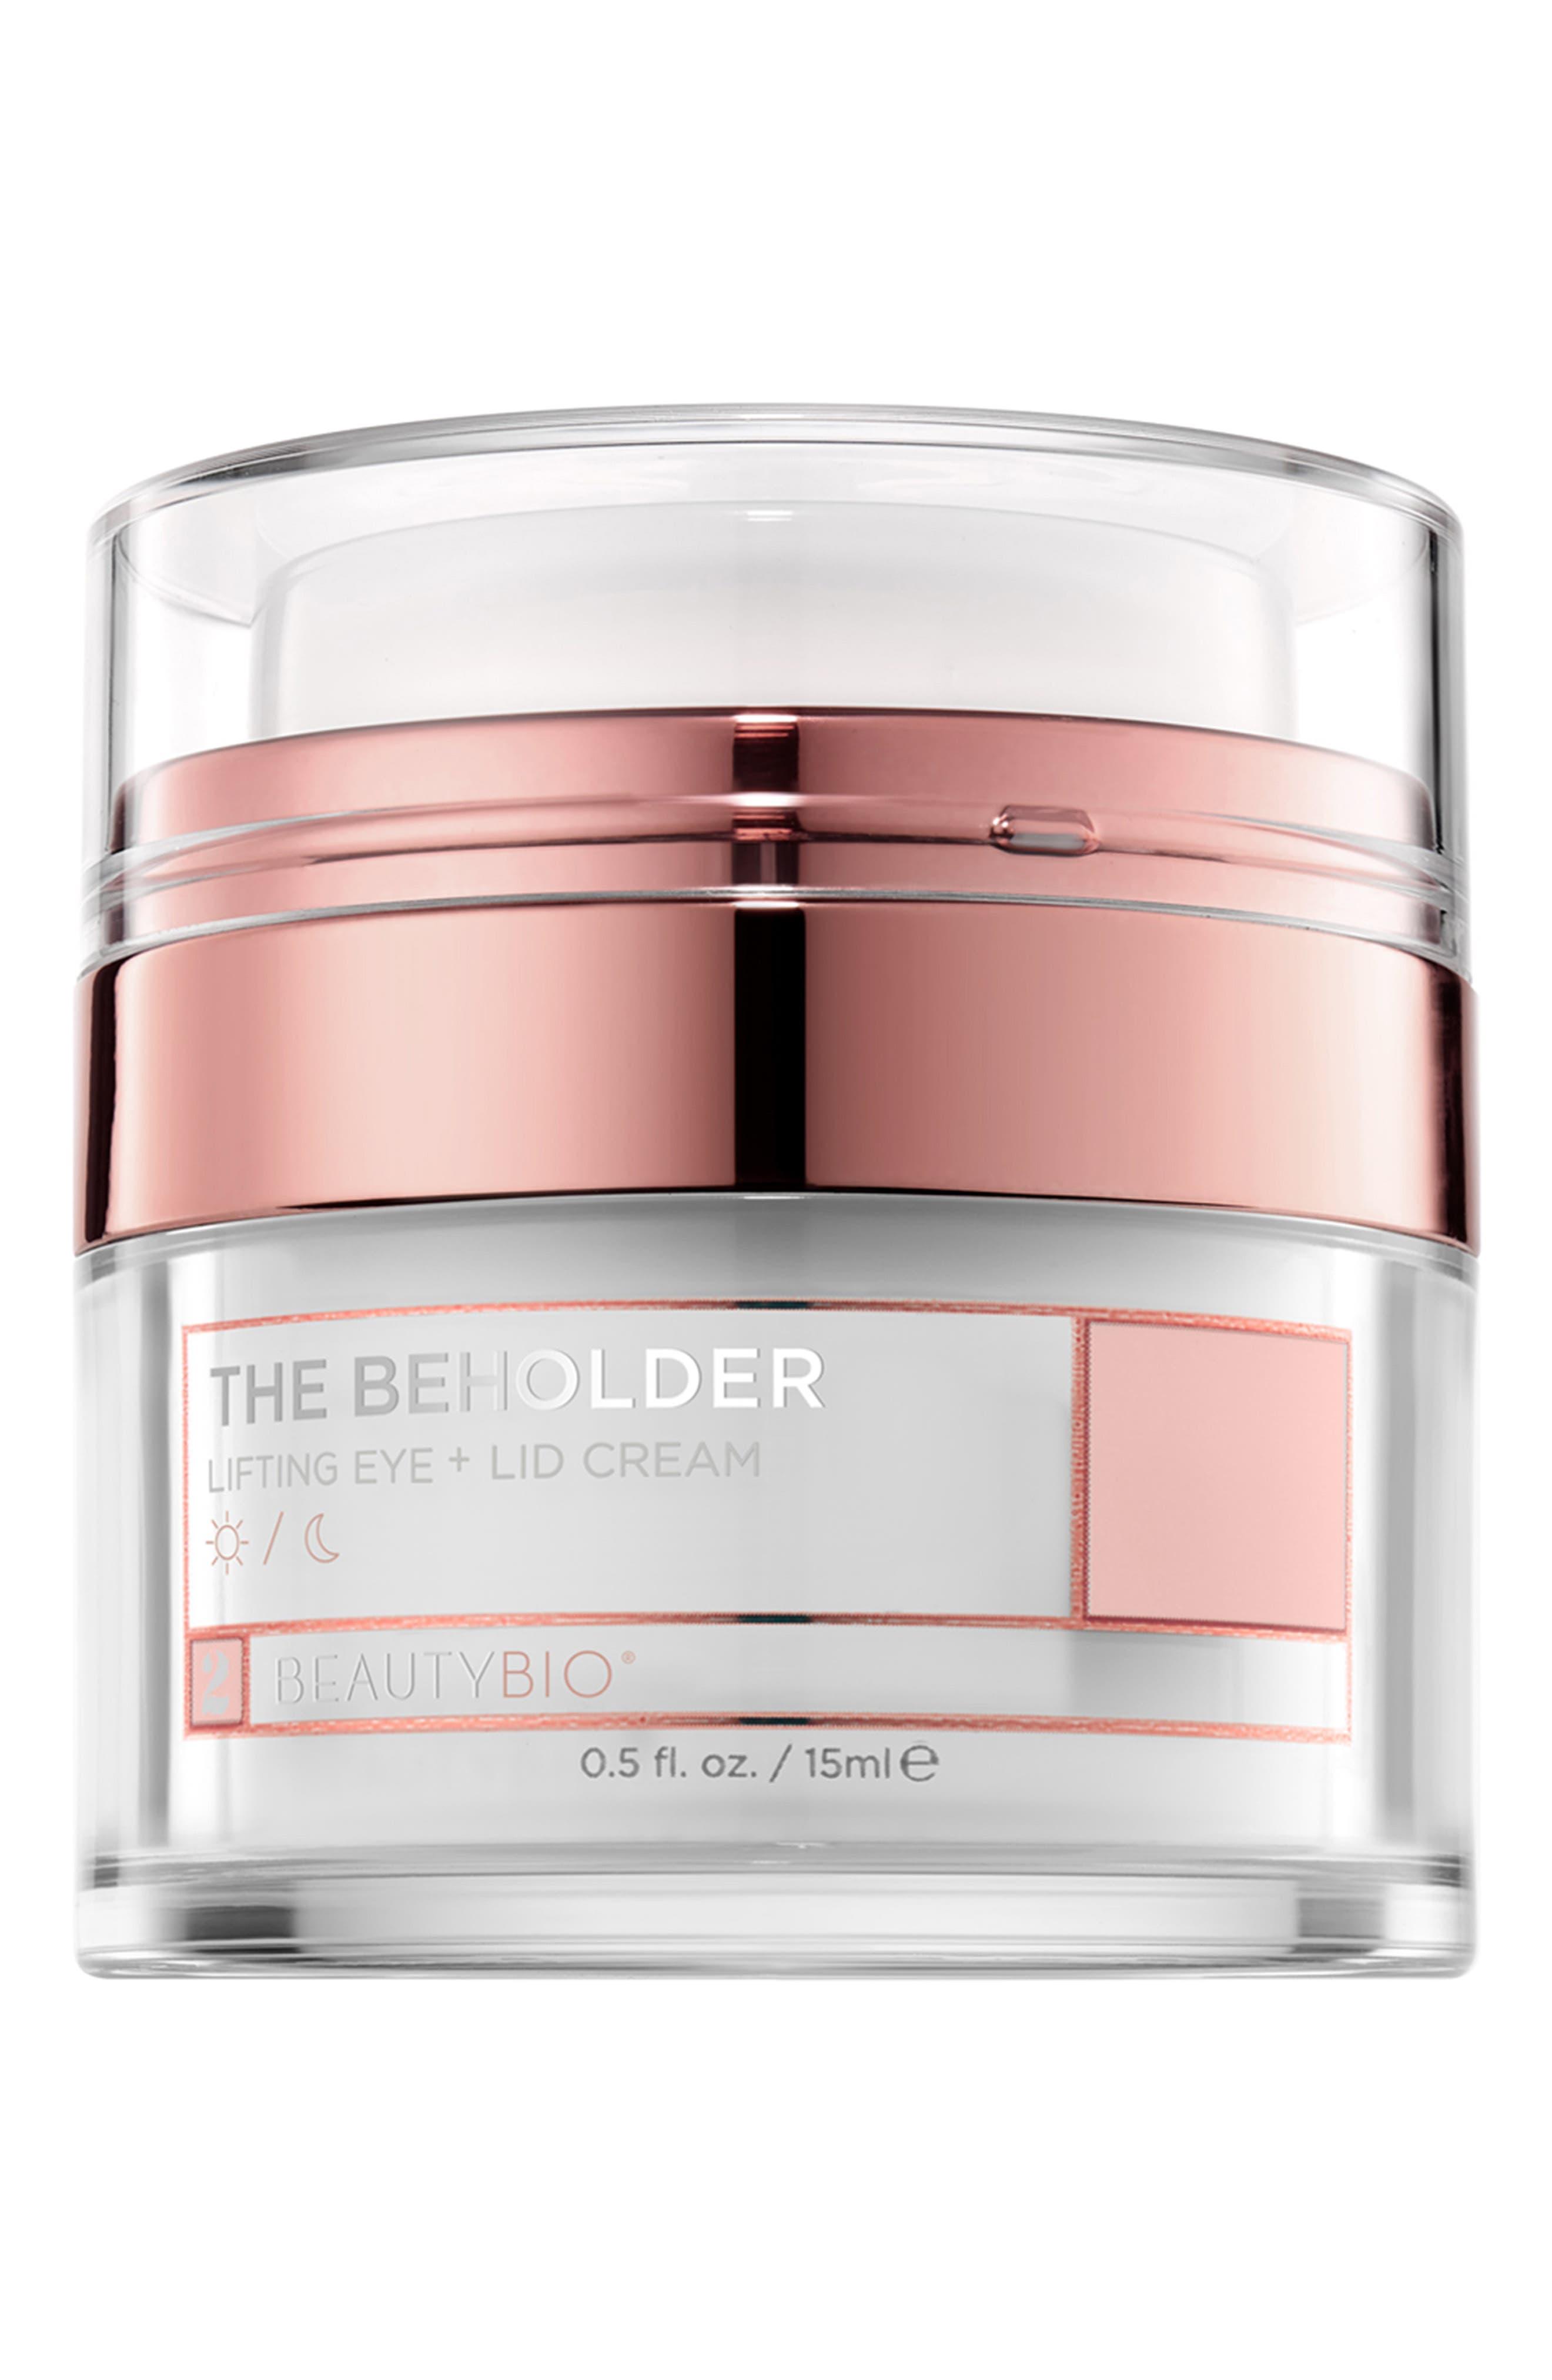 The Beholder Lifting Eye & Lid Cream